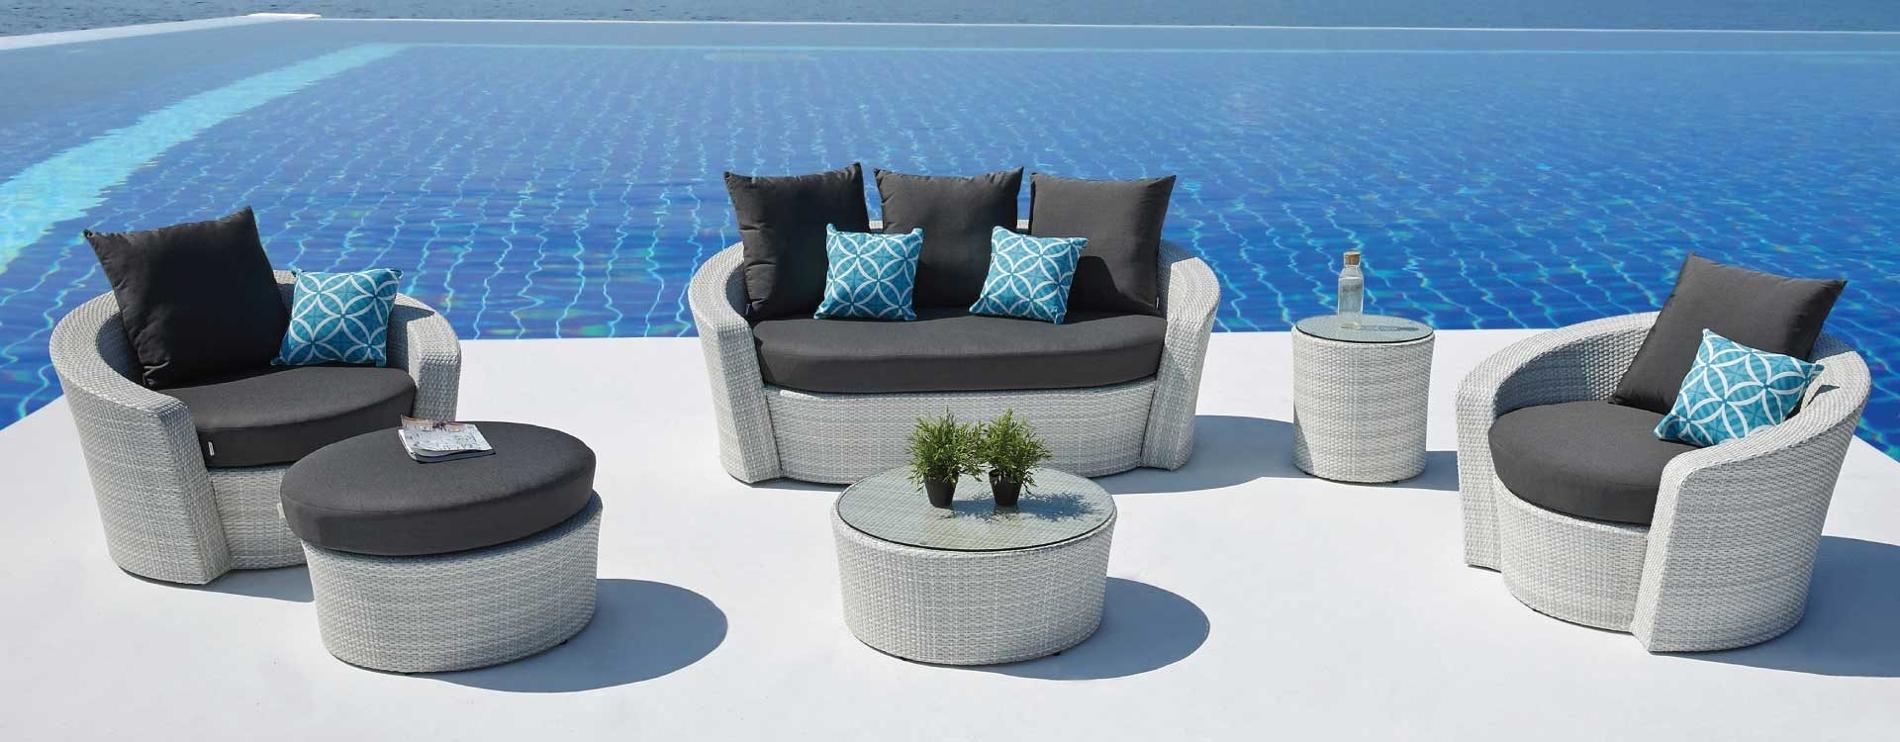 Barbados Rattan Outdoor Lounge Furniture